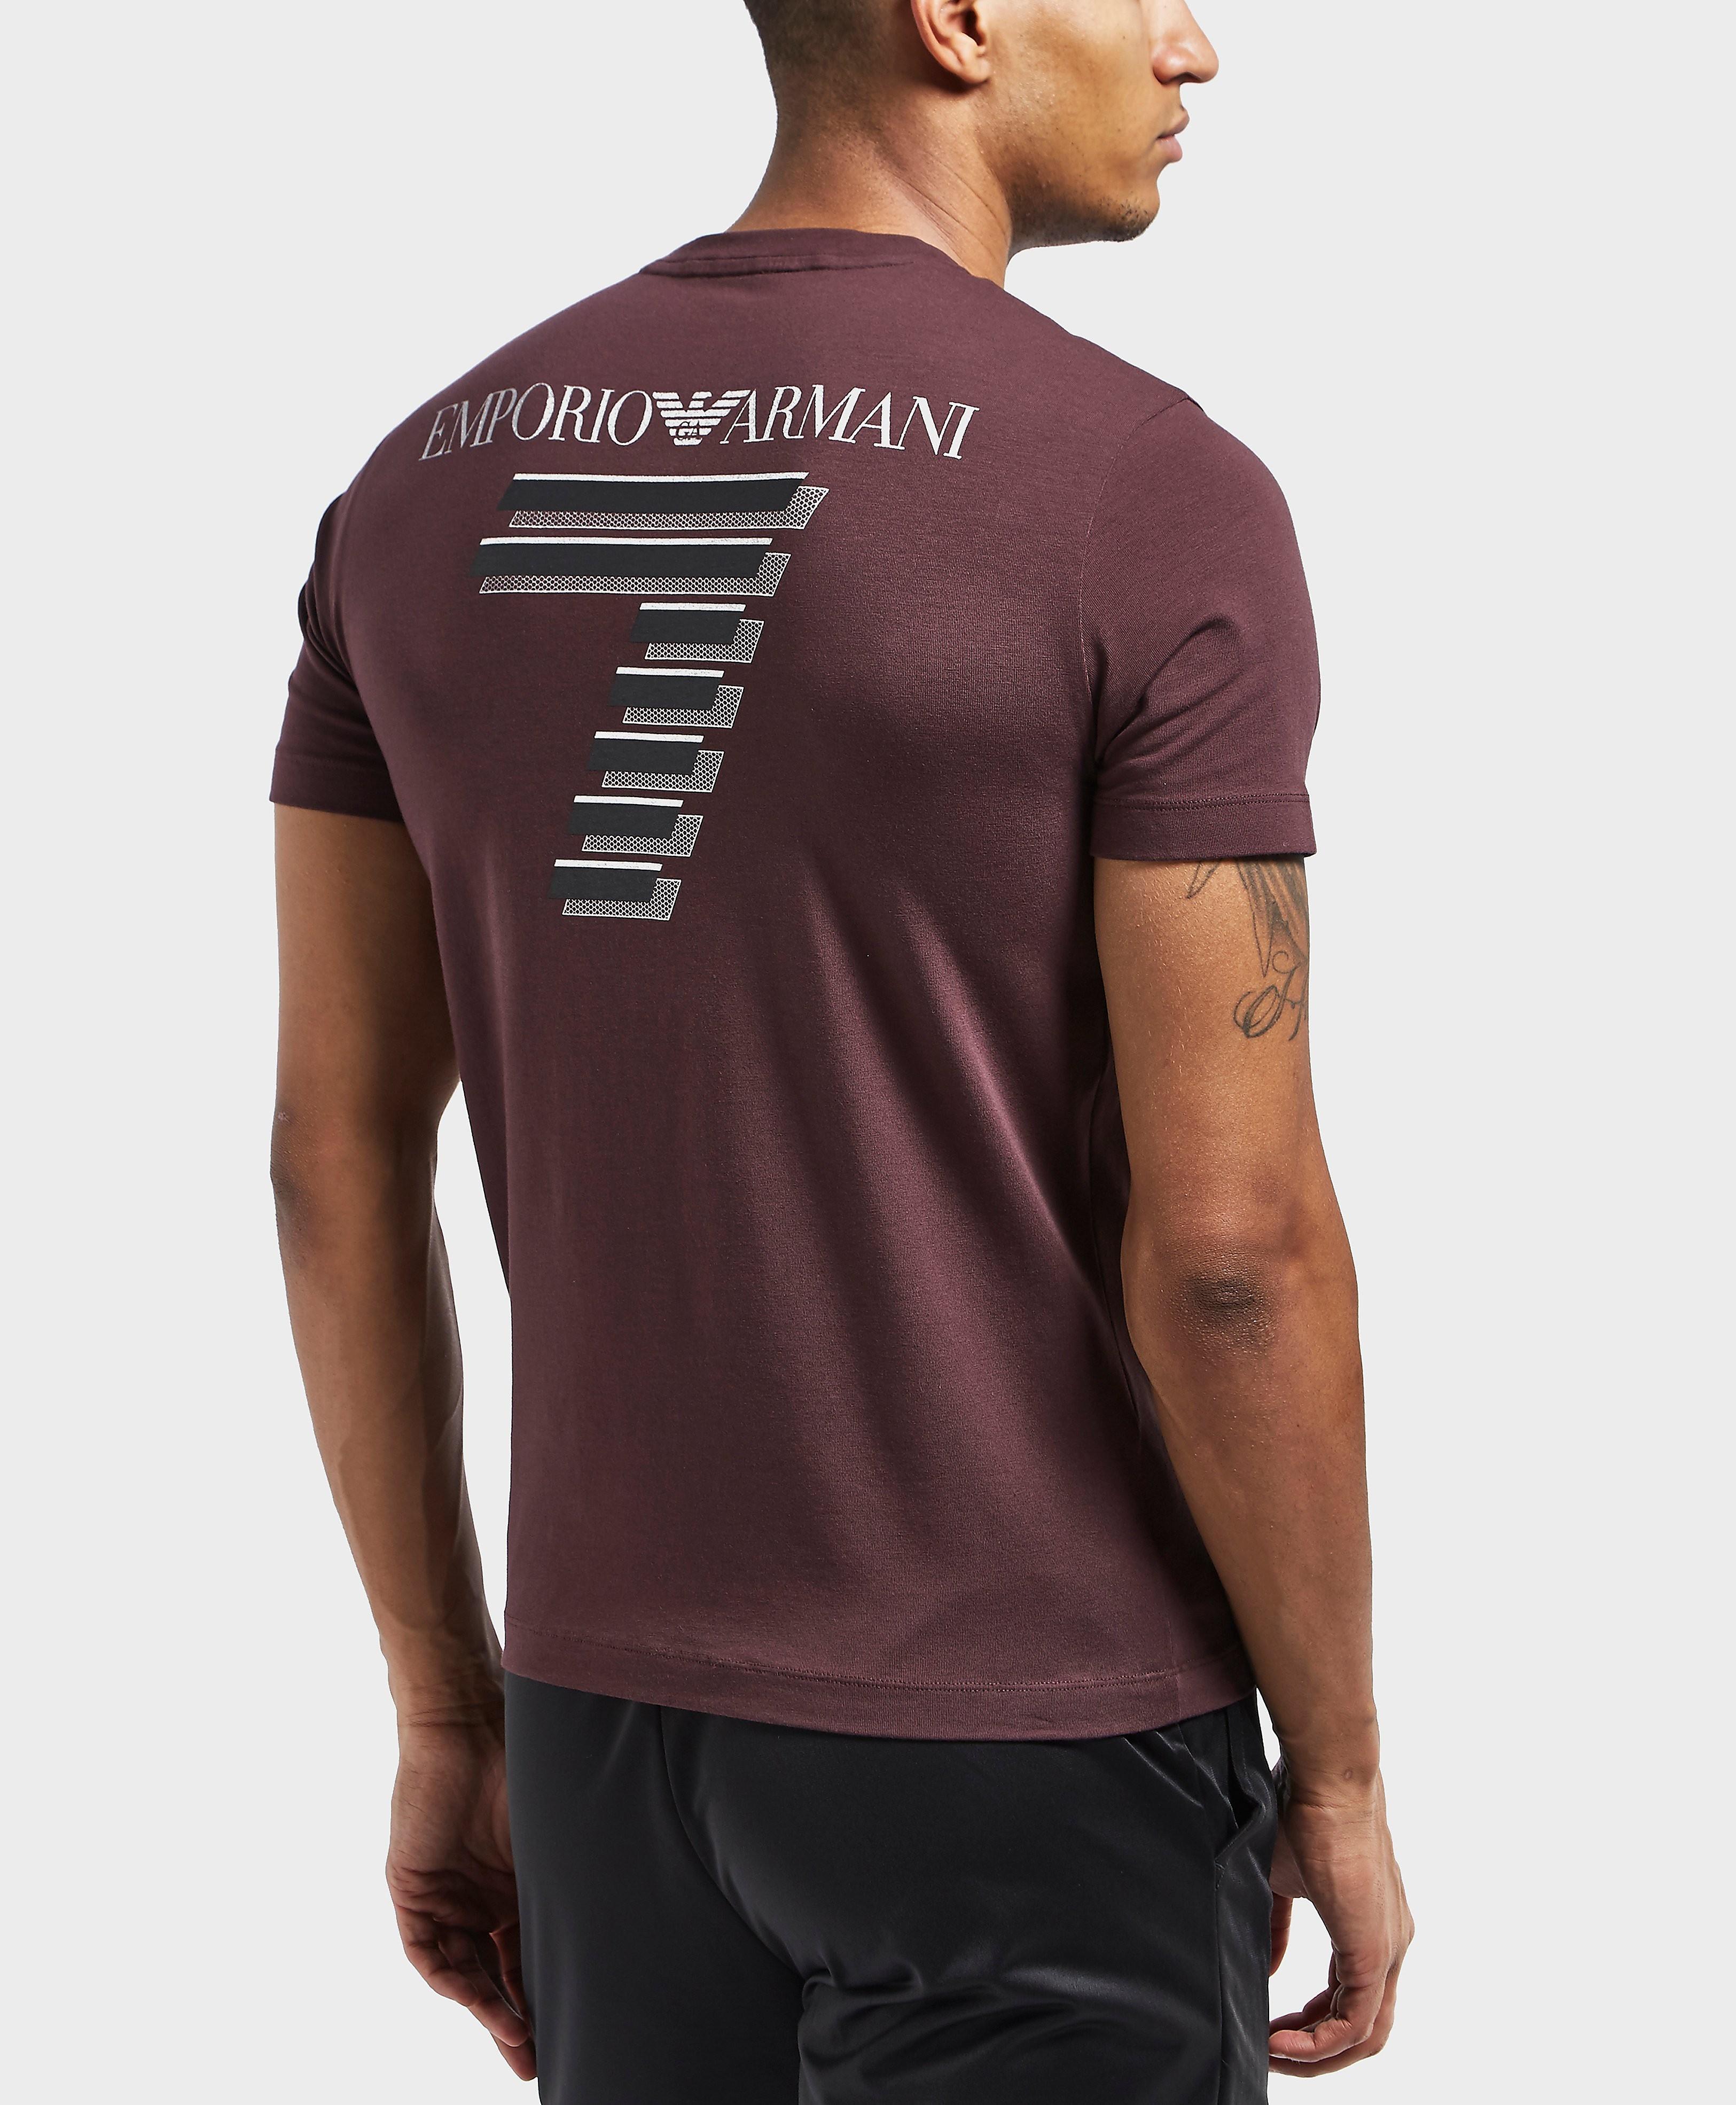 Emporio Armani EA7 Soccer Short Sleeve T-Shirt